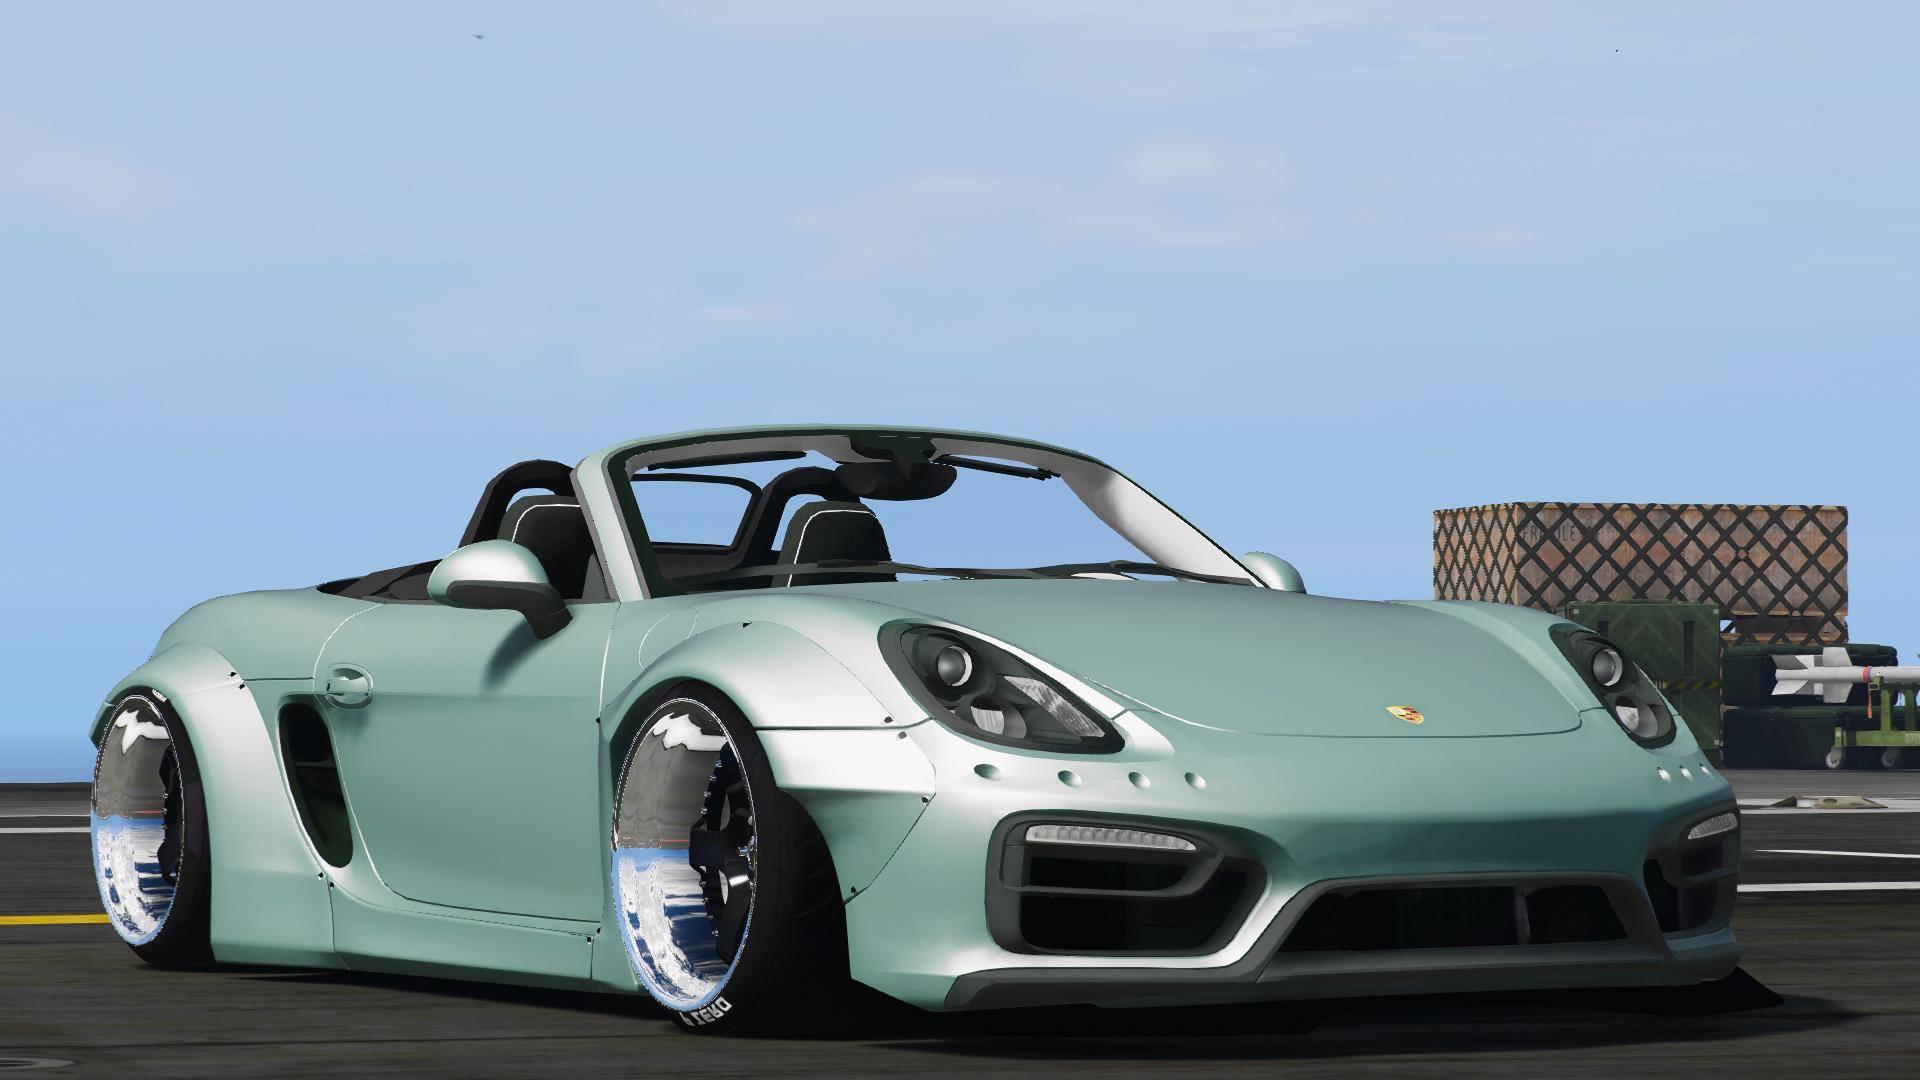 Porsche Boxster Liberty Walk Gta5 Mods Com